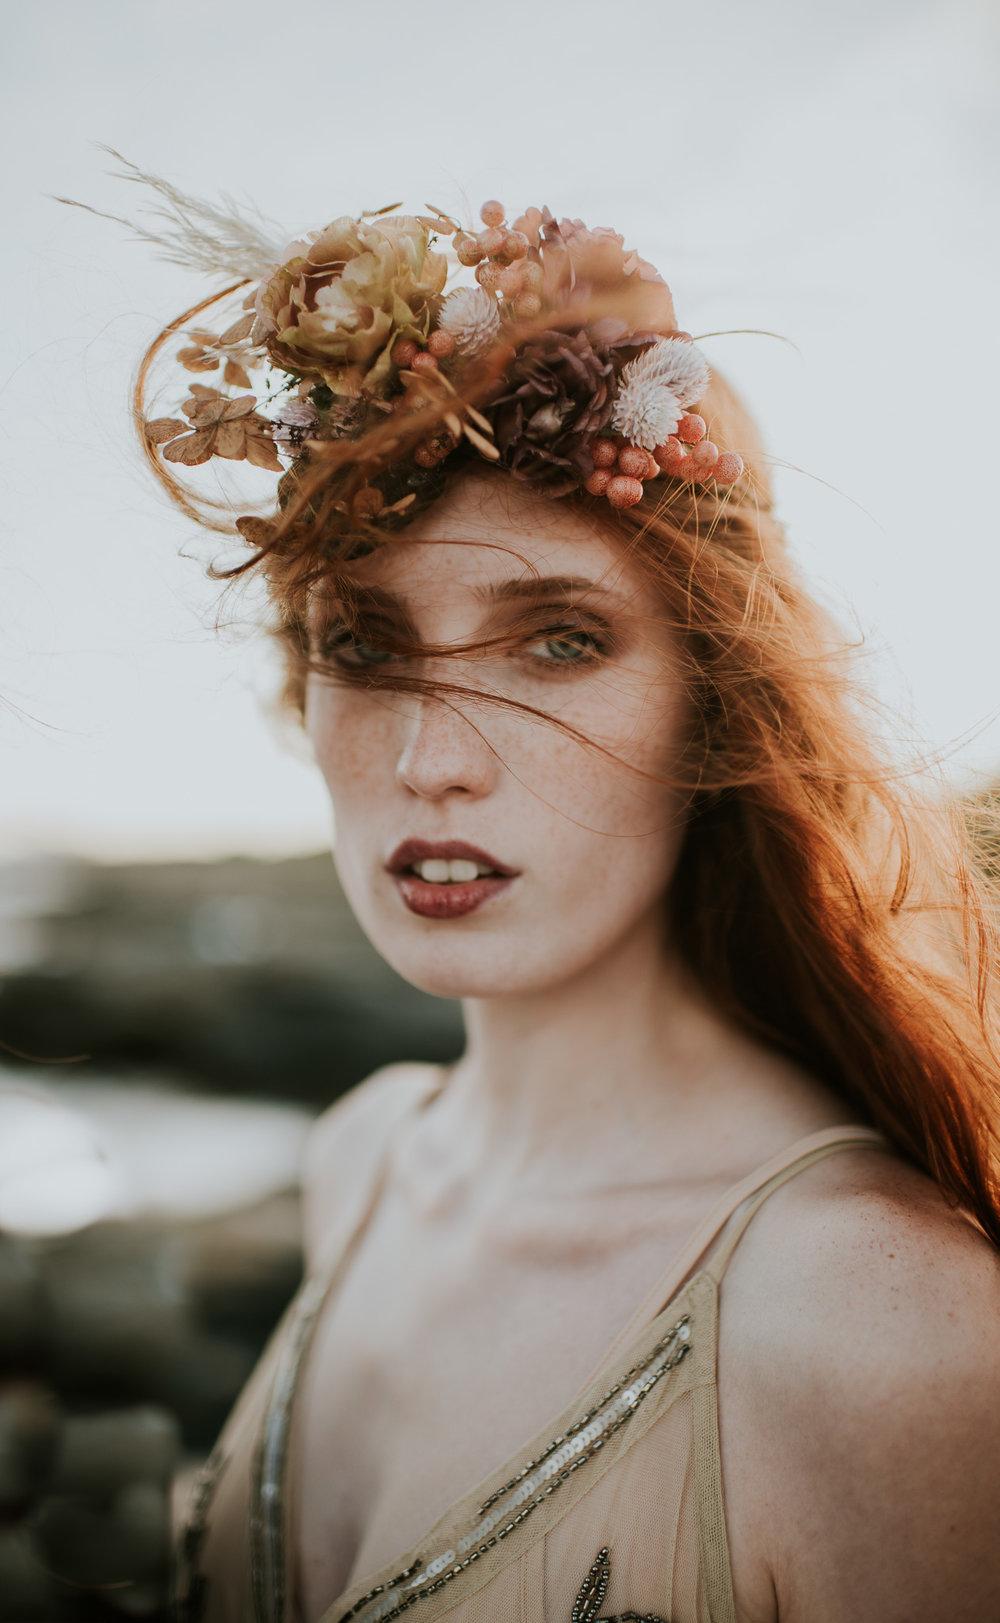 Allison Markova - Tribe Archipelago LXC 04